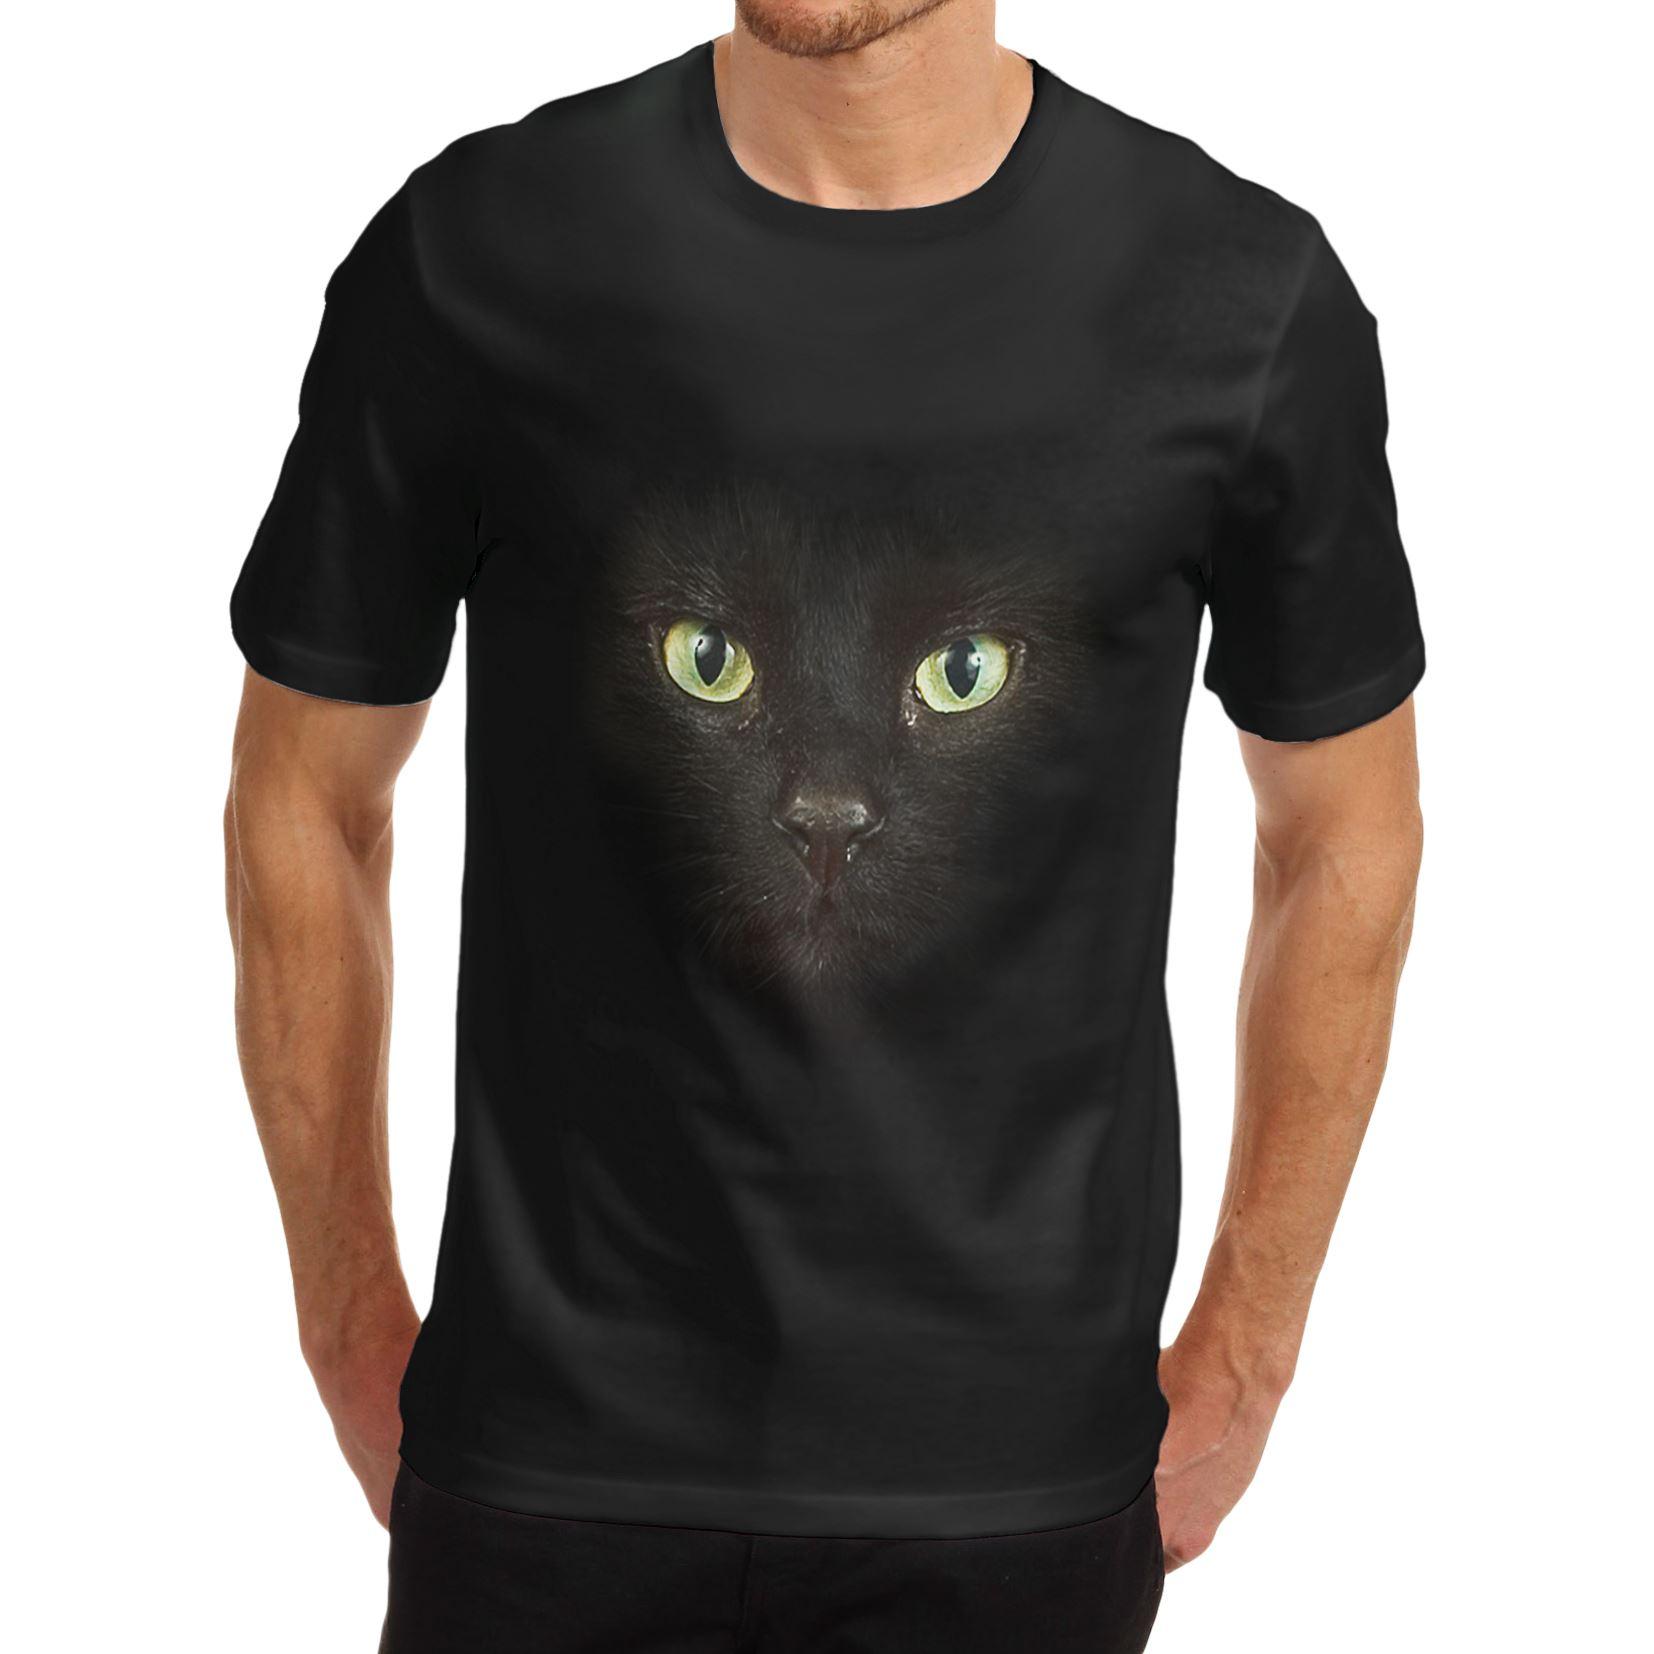 Cat Face t Shirts Cat Face Print T-shirt